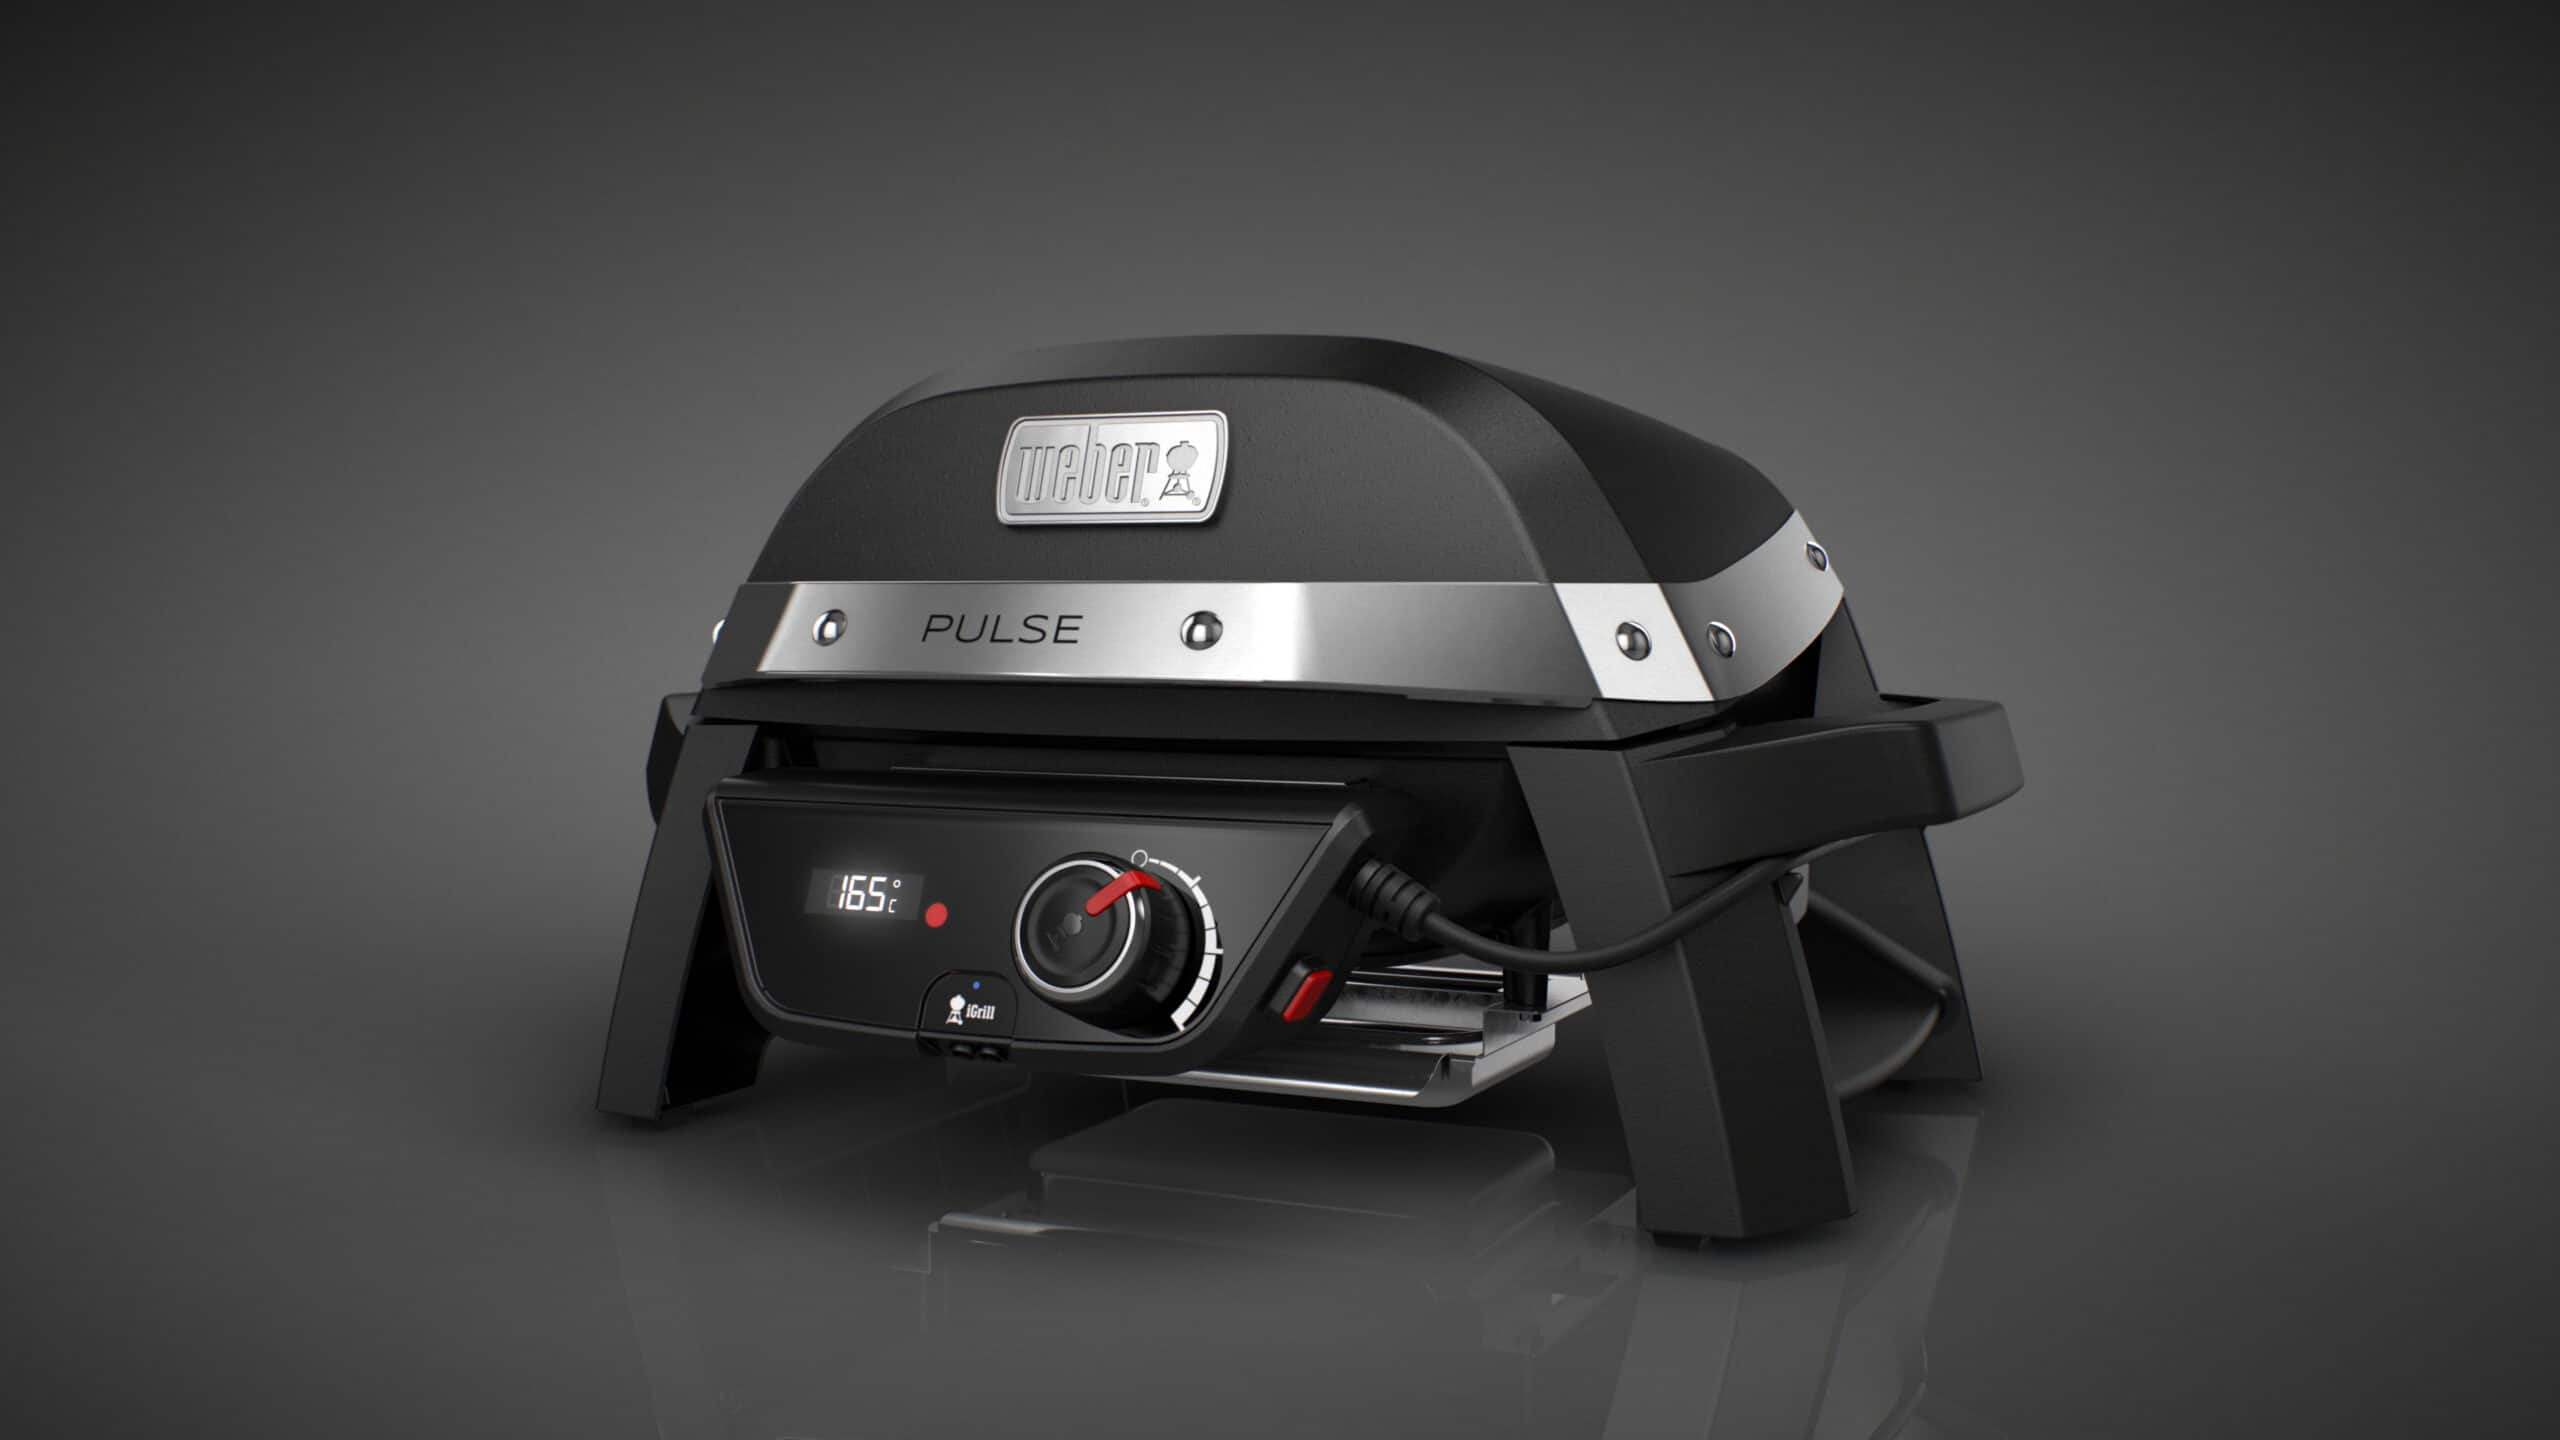 weber pulse elektrogrill smartgrill mit igrill technologoy. Black Bedroom Furniture Sets. Home Design Ideas